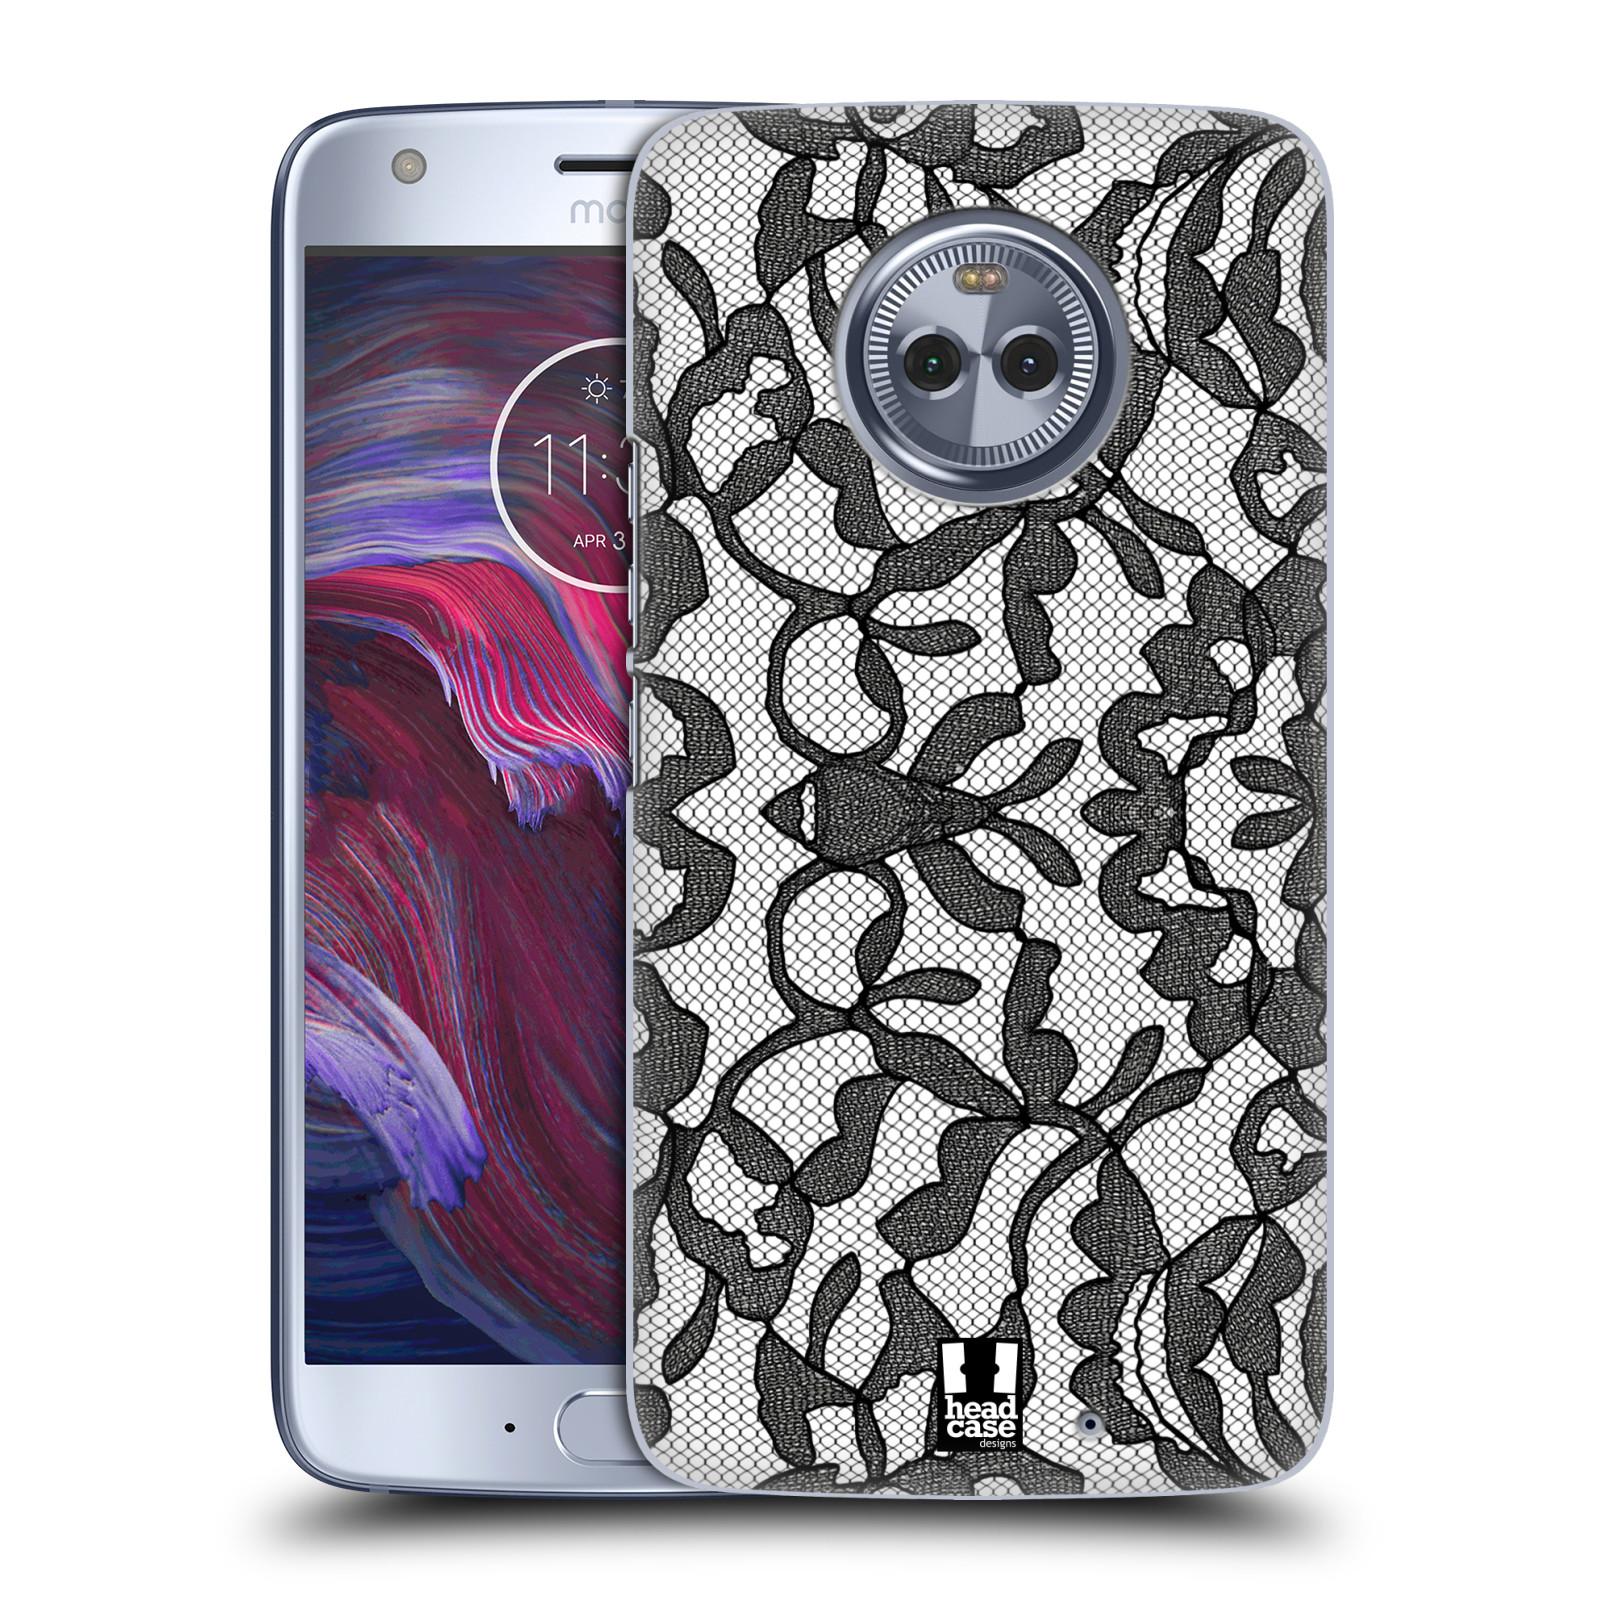 Plastové pouzdro na mobil Lenovo Moto X4 - Head Case - LEAFY KRAJKA